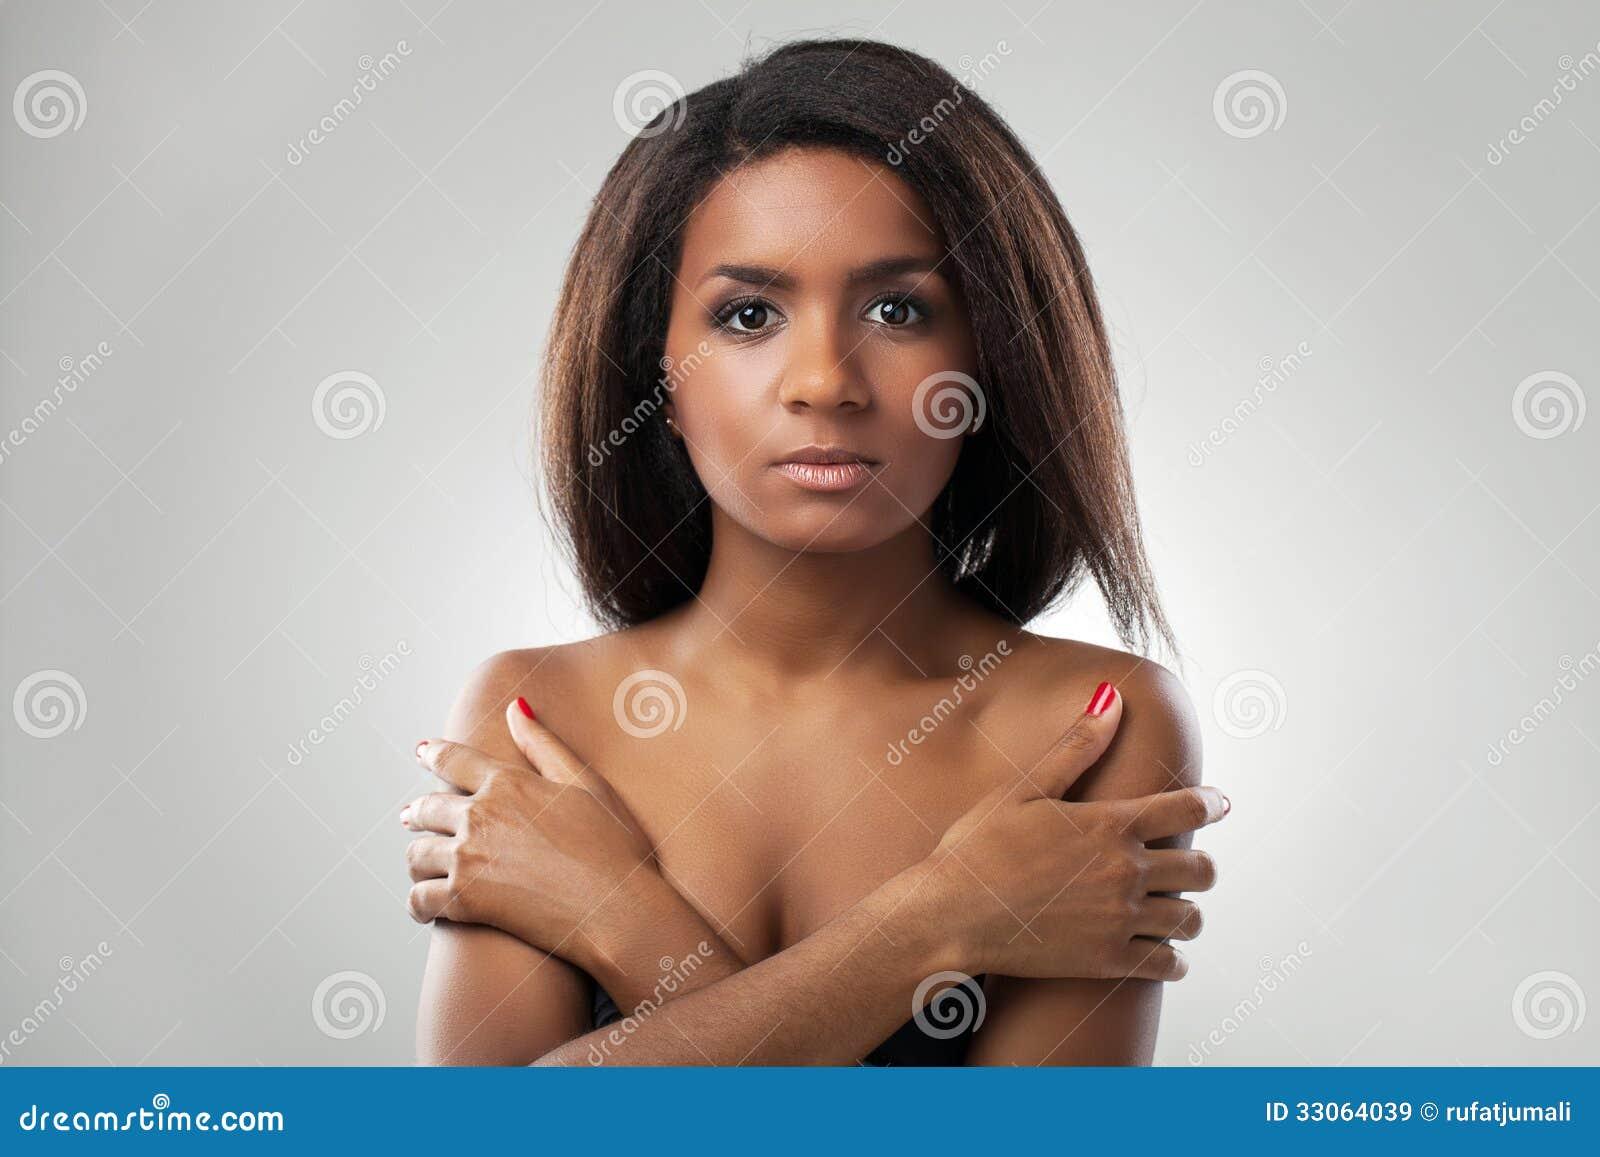 nude beach mom daughter boobs